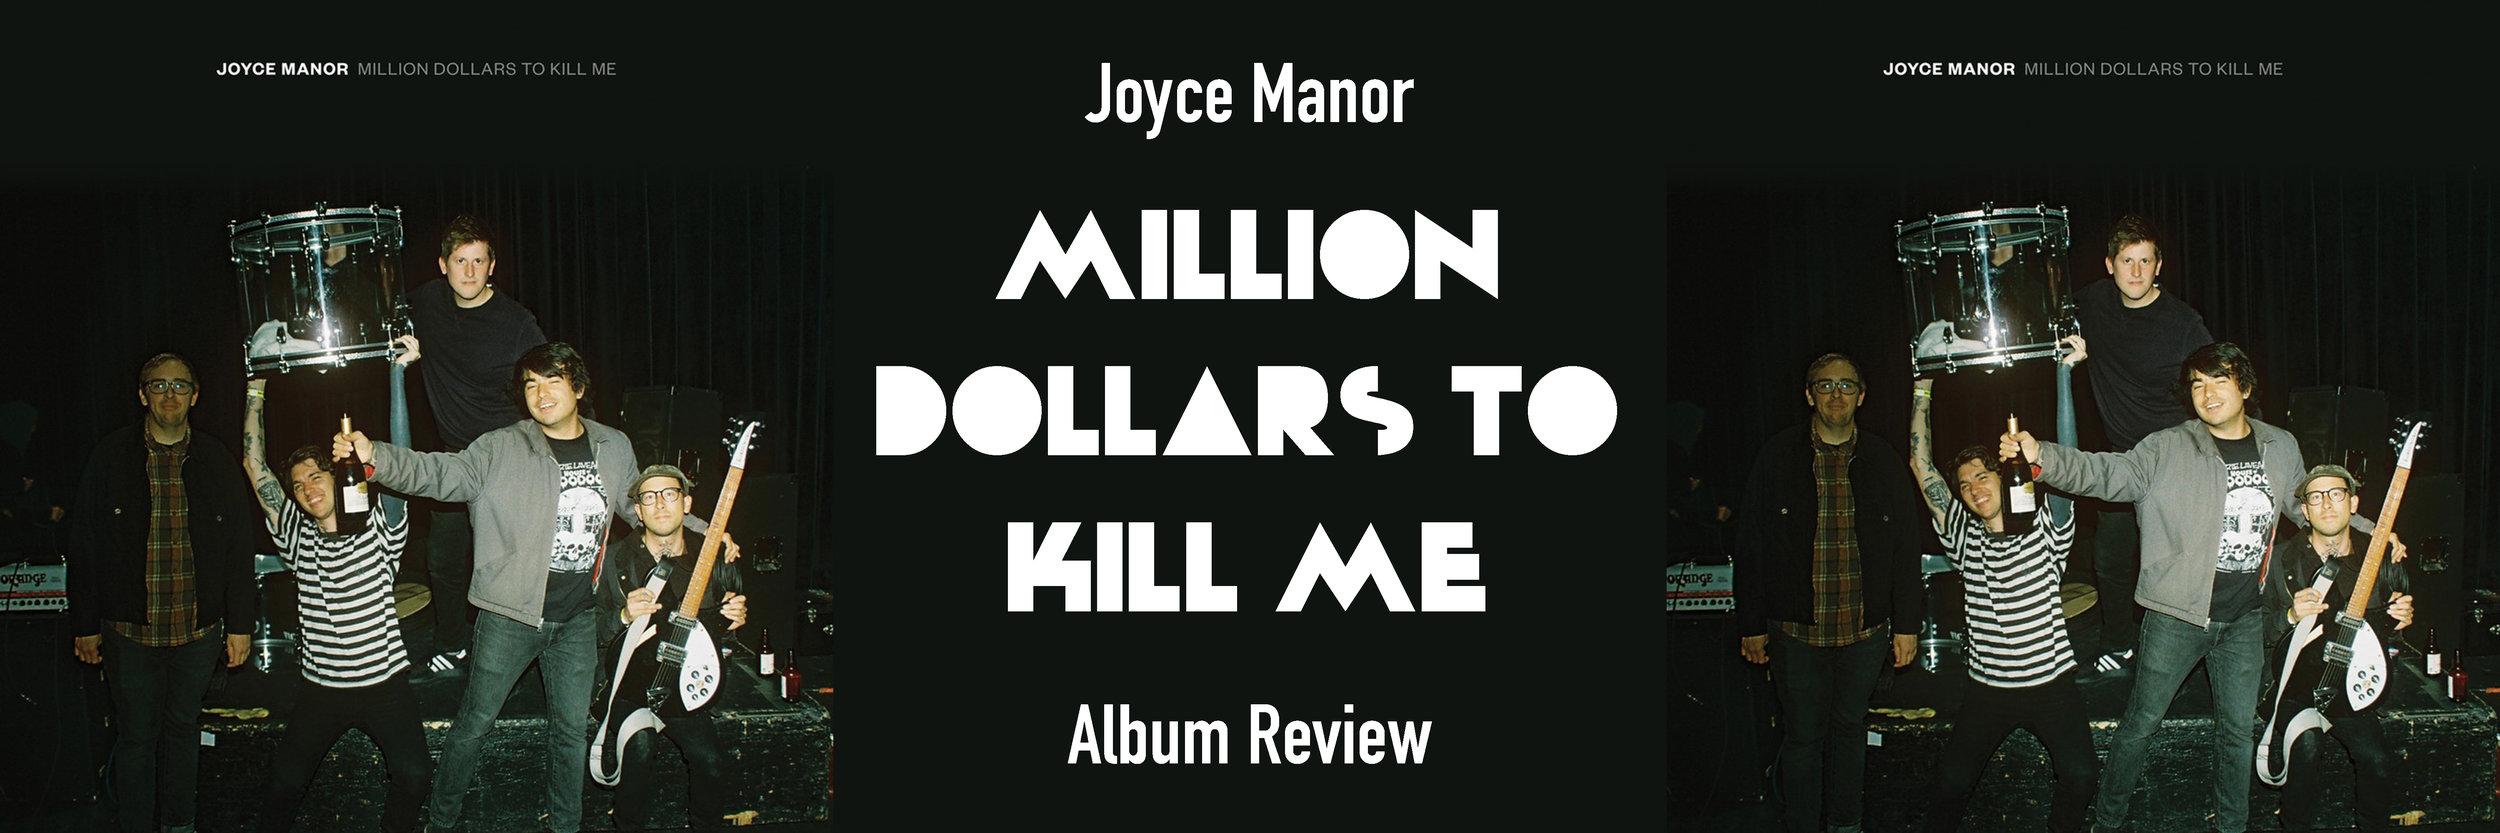 "Joyce Manor ""Million Dollars to Kill Me"" Album Review.jpg"